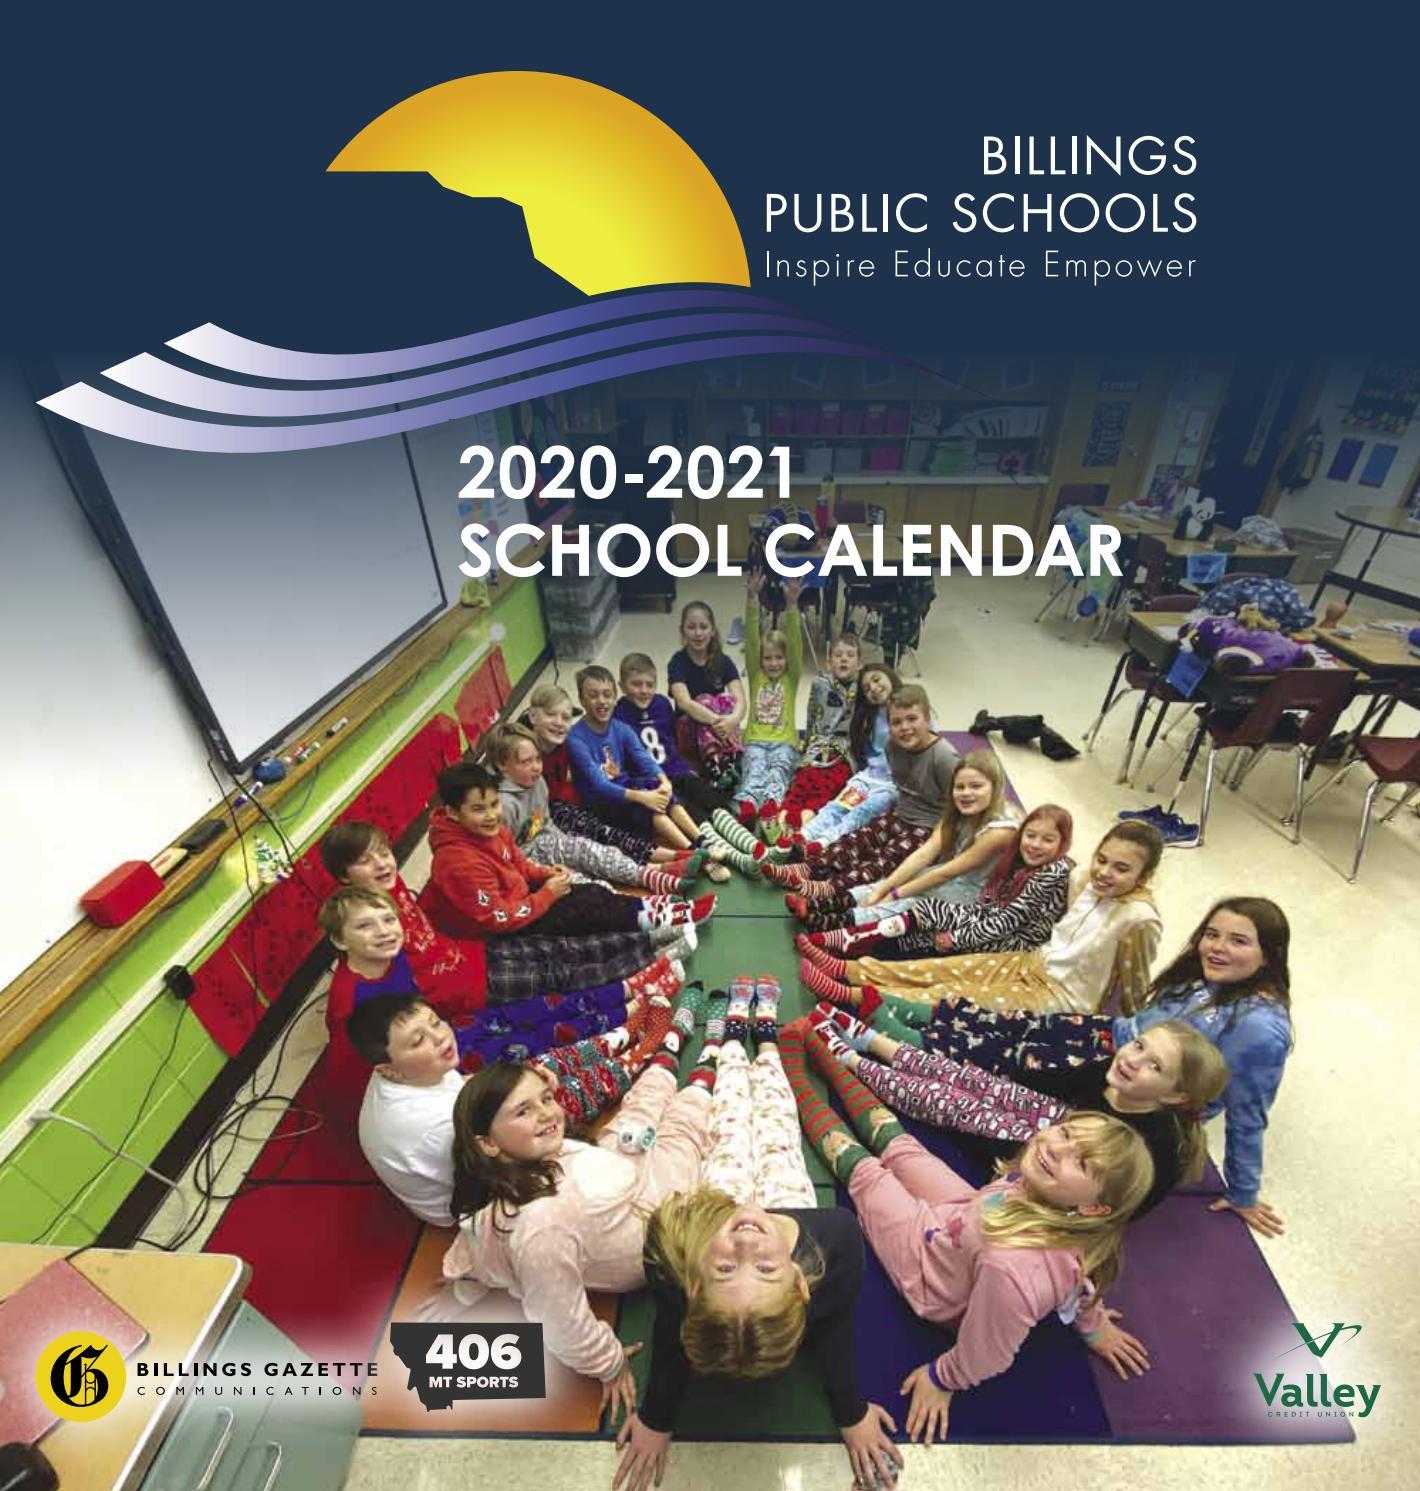 Billings School District 2 2020 2021 Calendarbillings With Billings School District 2 Calander